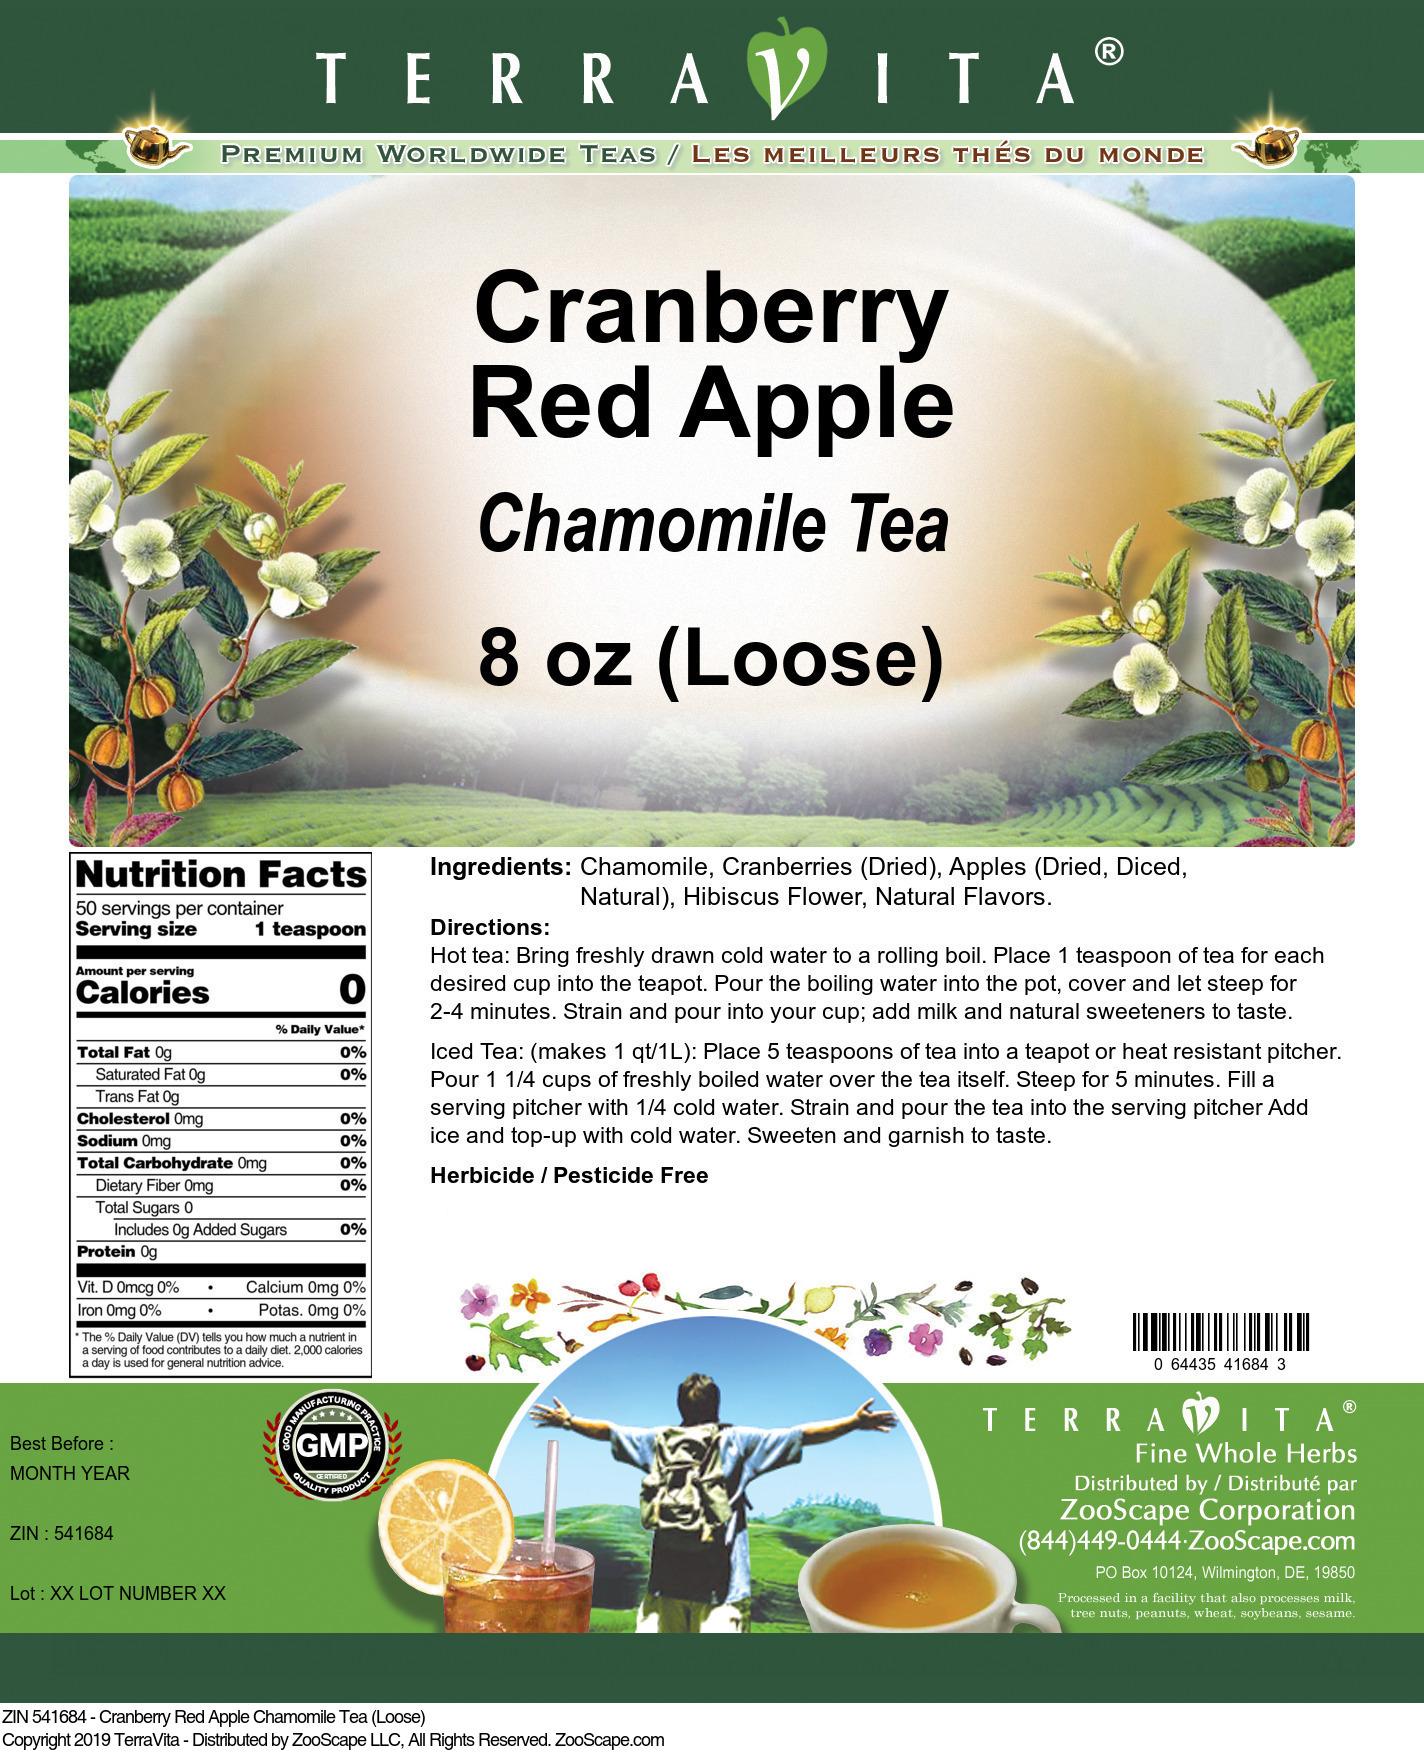 Cranberry Red Apple Chamomile Tea